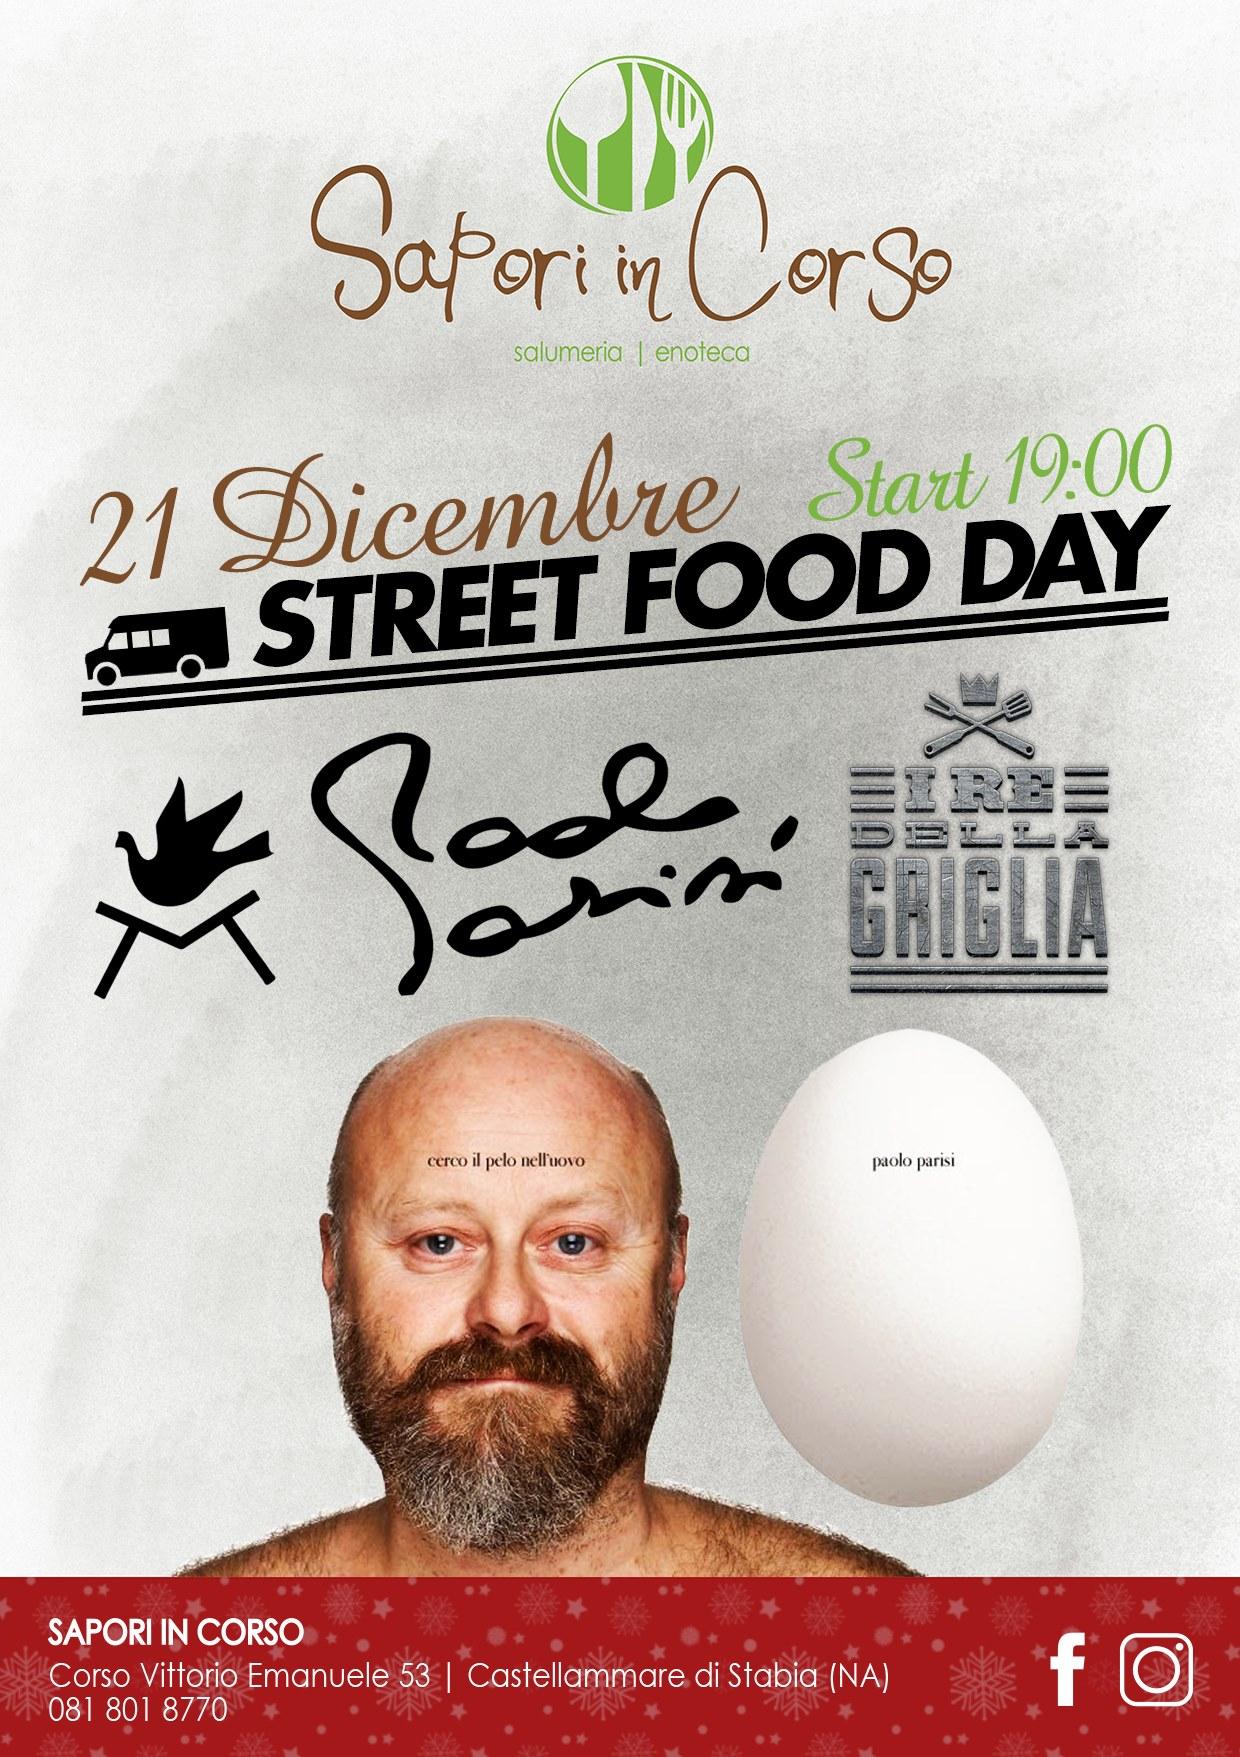 Street food day con Paolo Parisi a Sapori in Corso